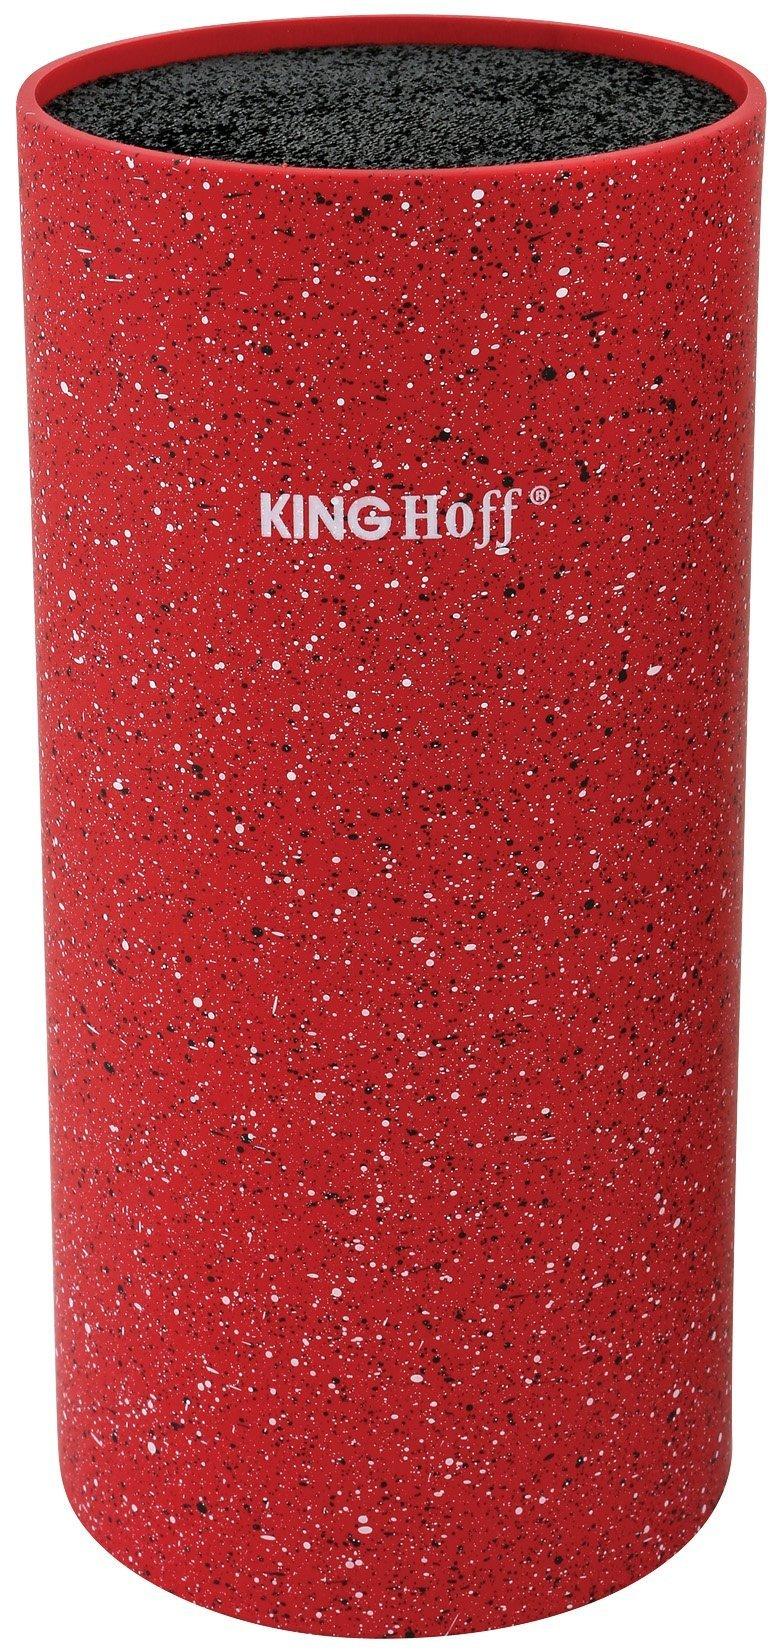 Подставка для ножей KING hoff KH-1093